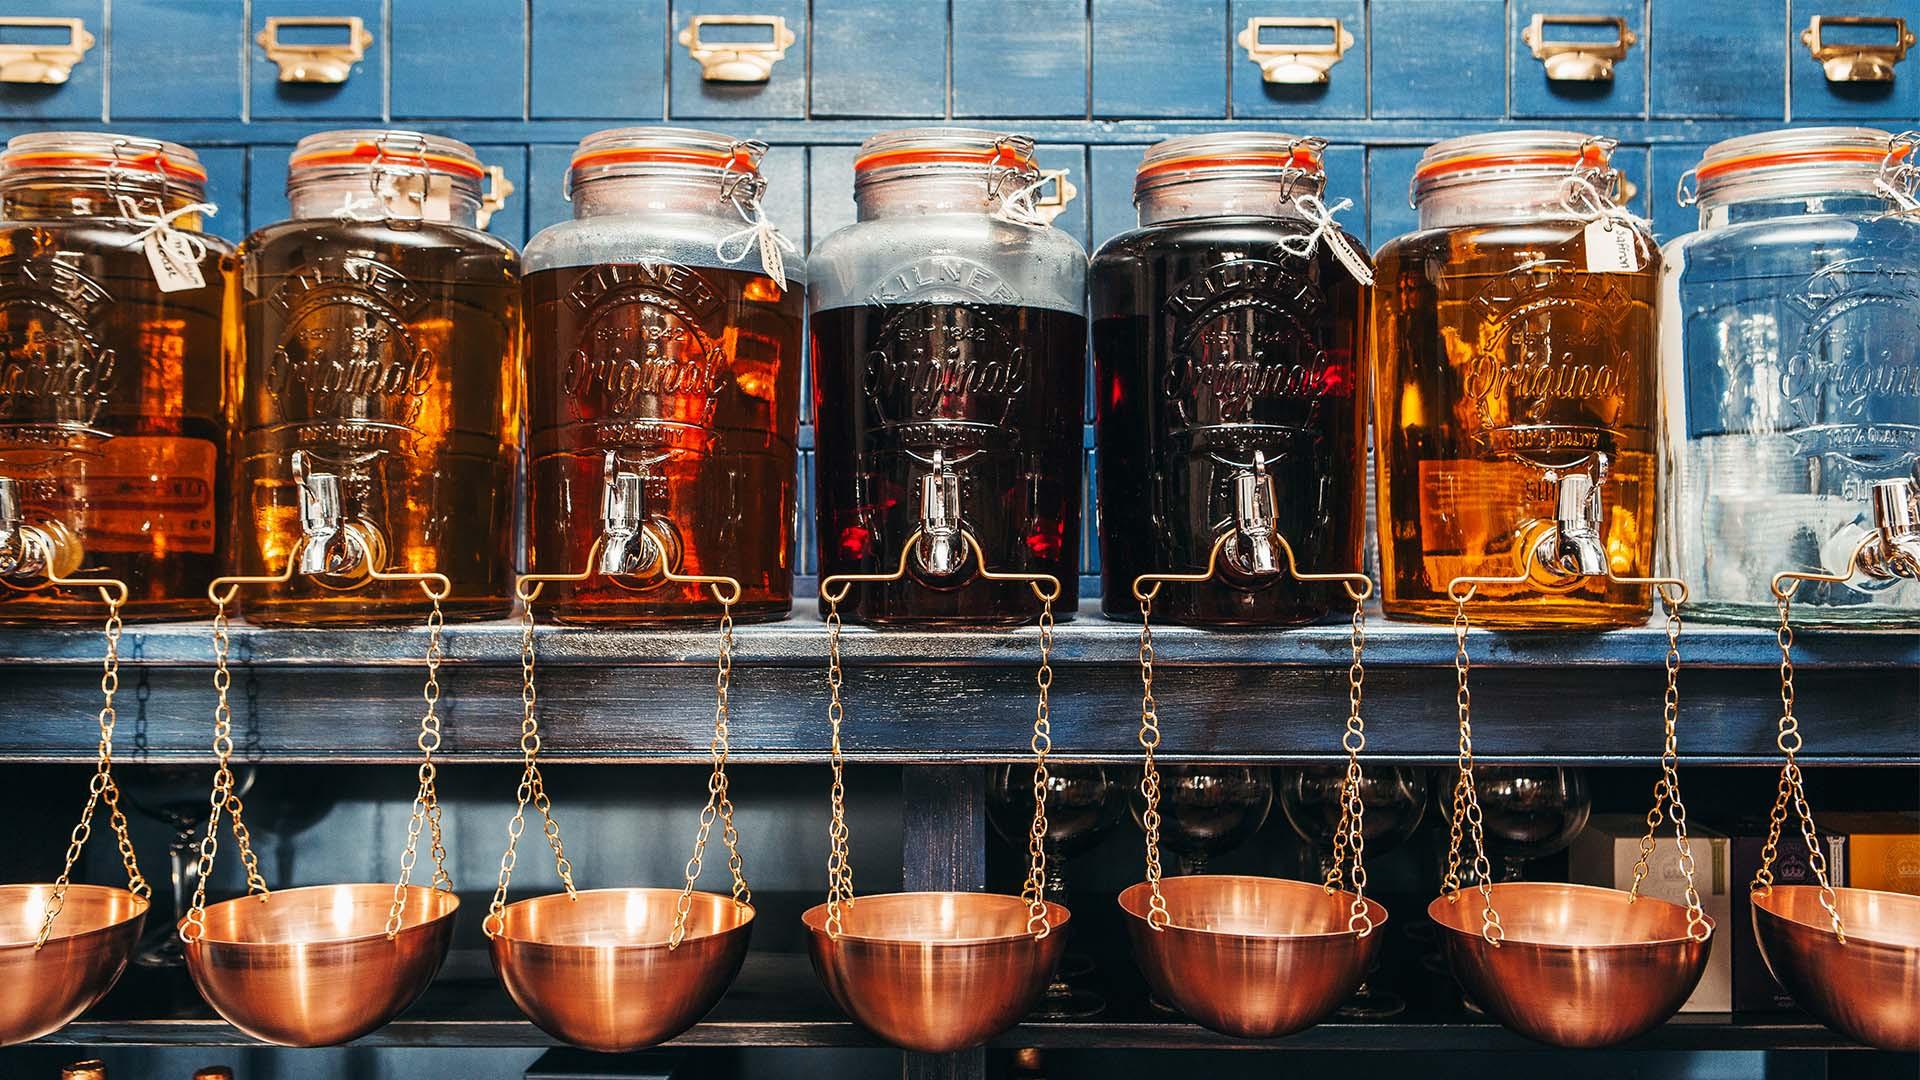 Gin infusions in kilner jars, Slingsby, Harrogate